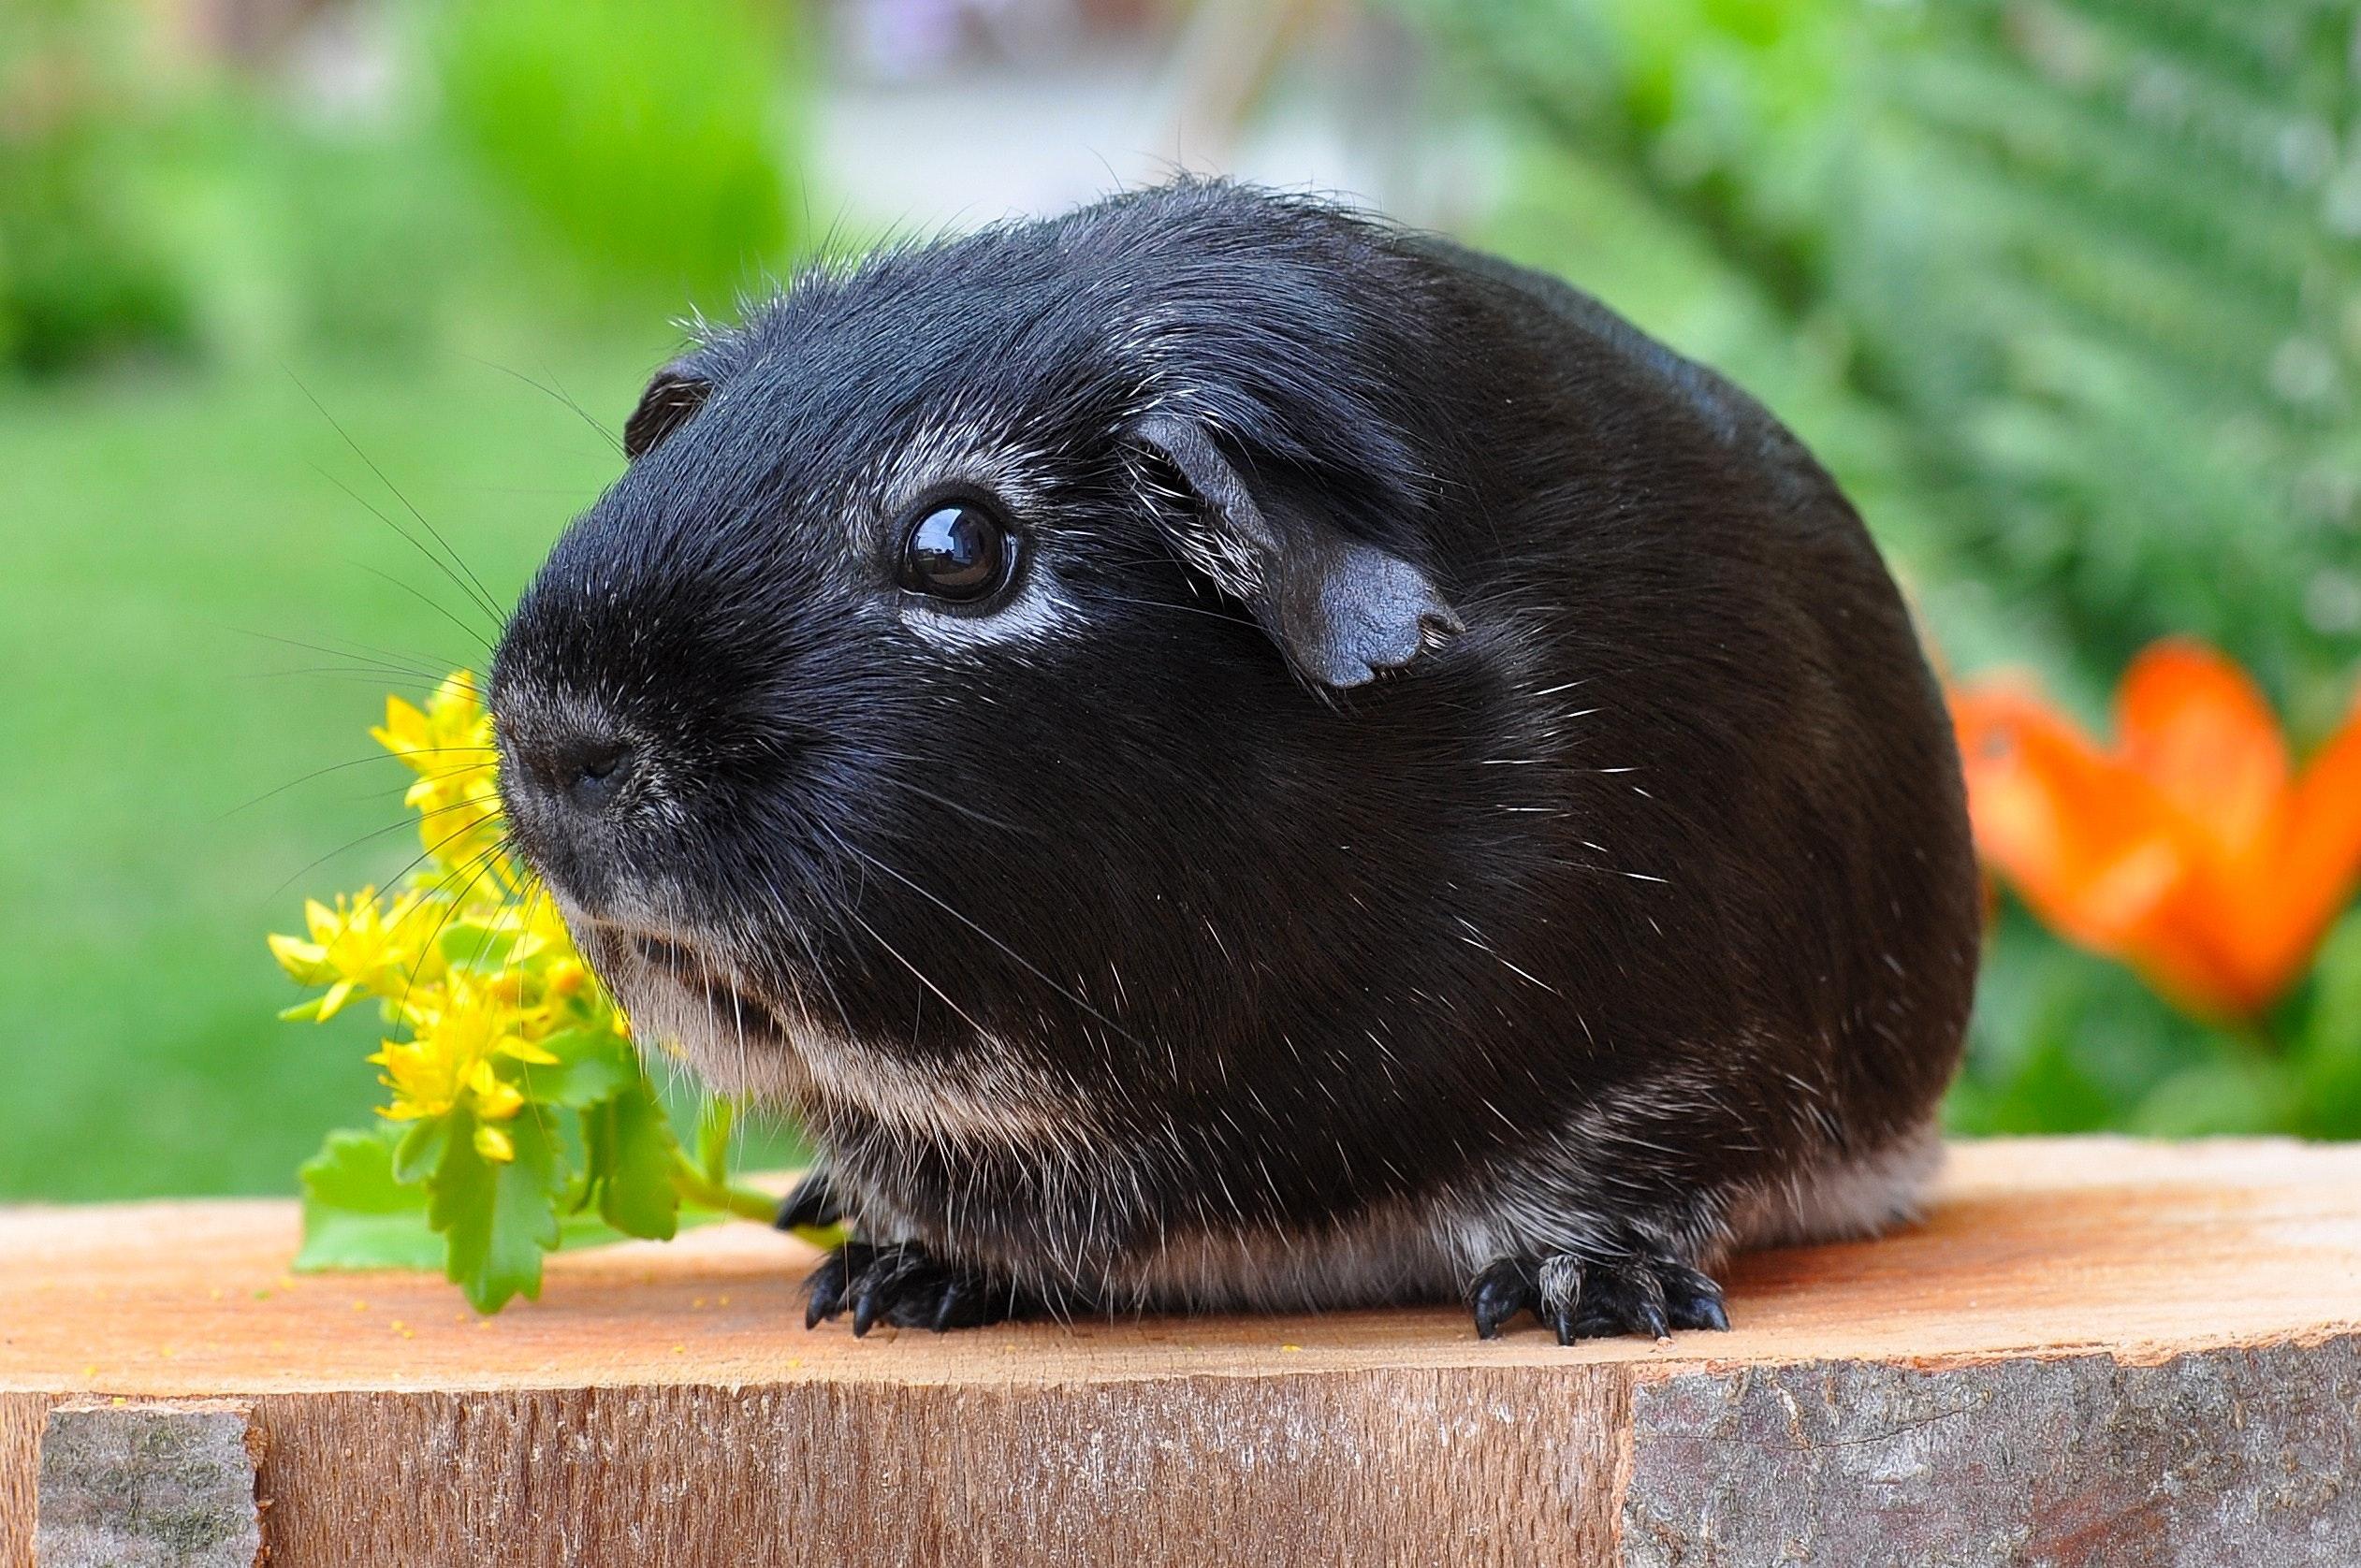 Black Guinea